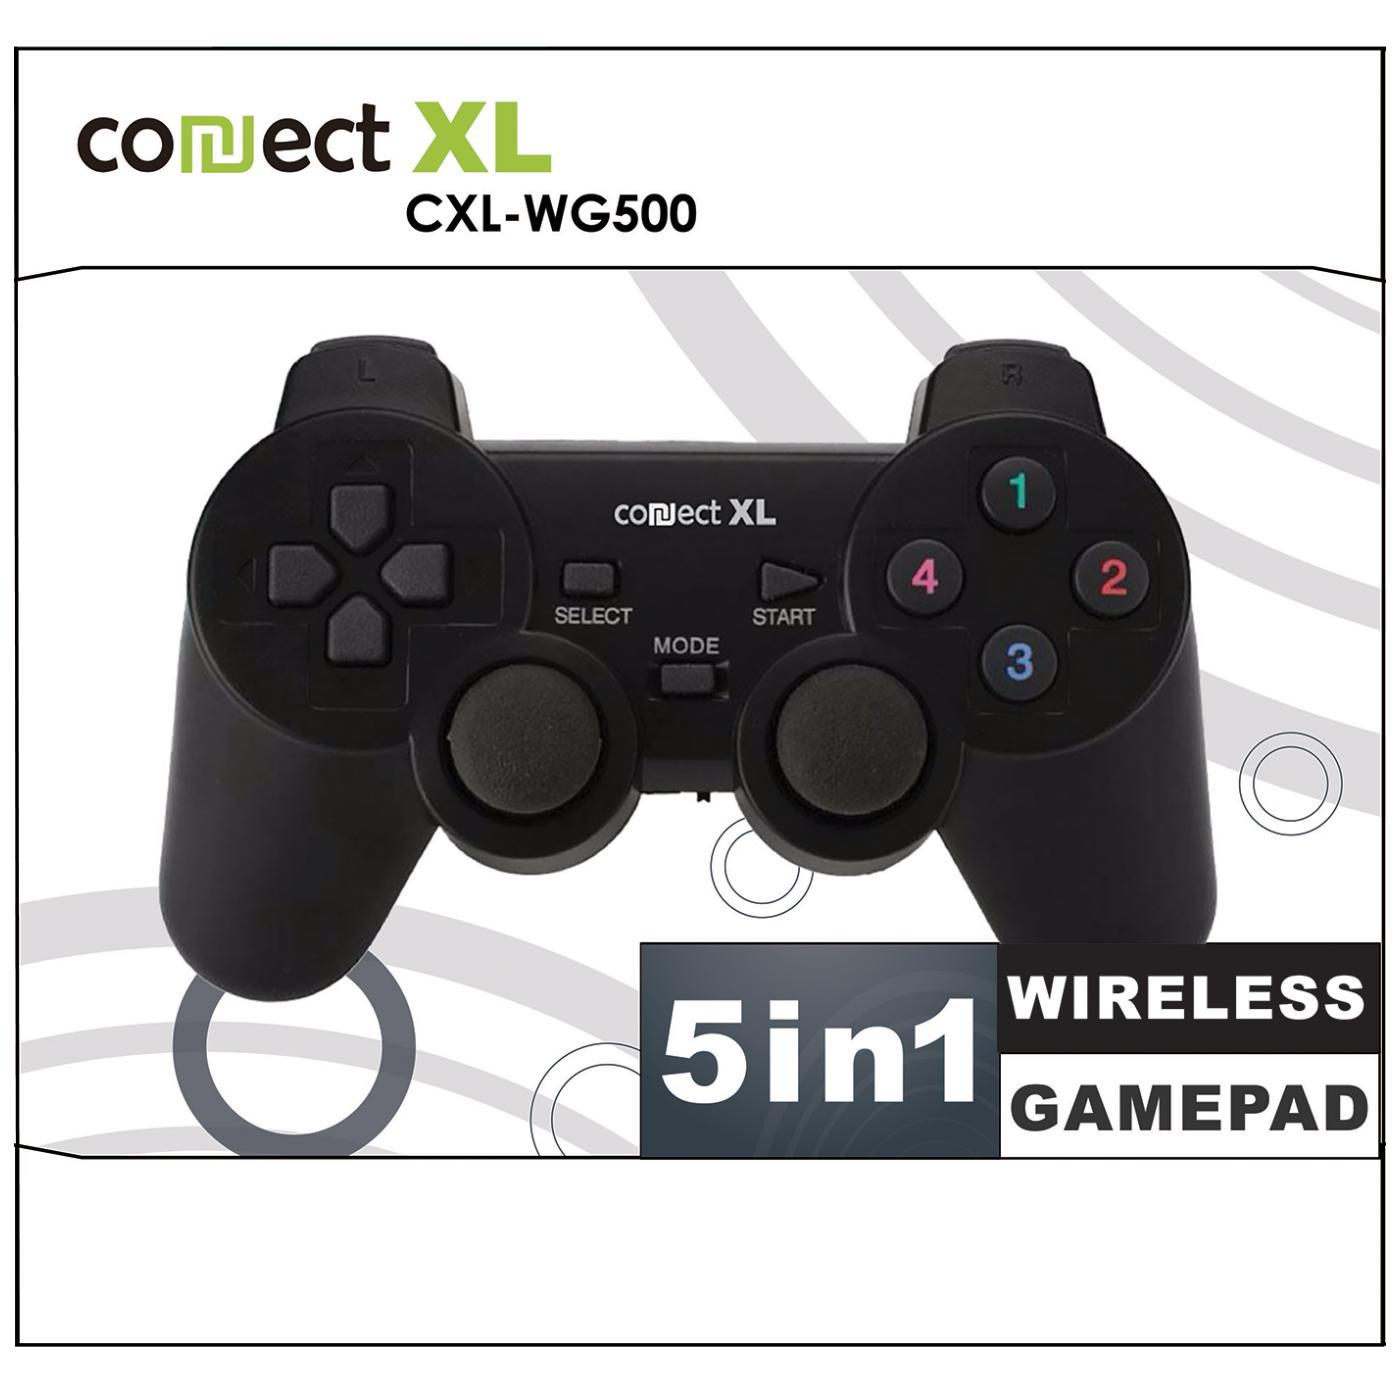 Connect XL - CXL-WG500